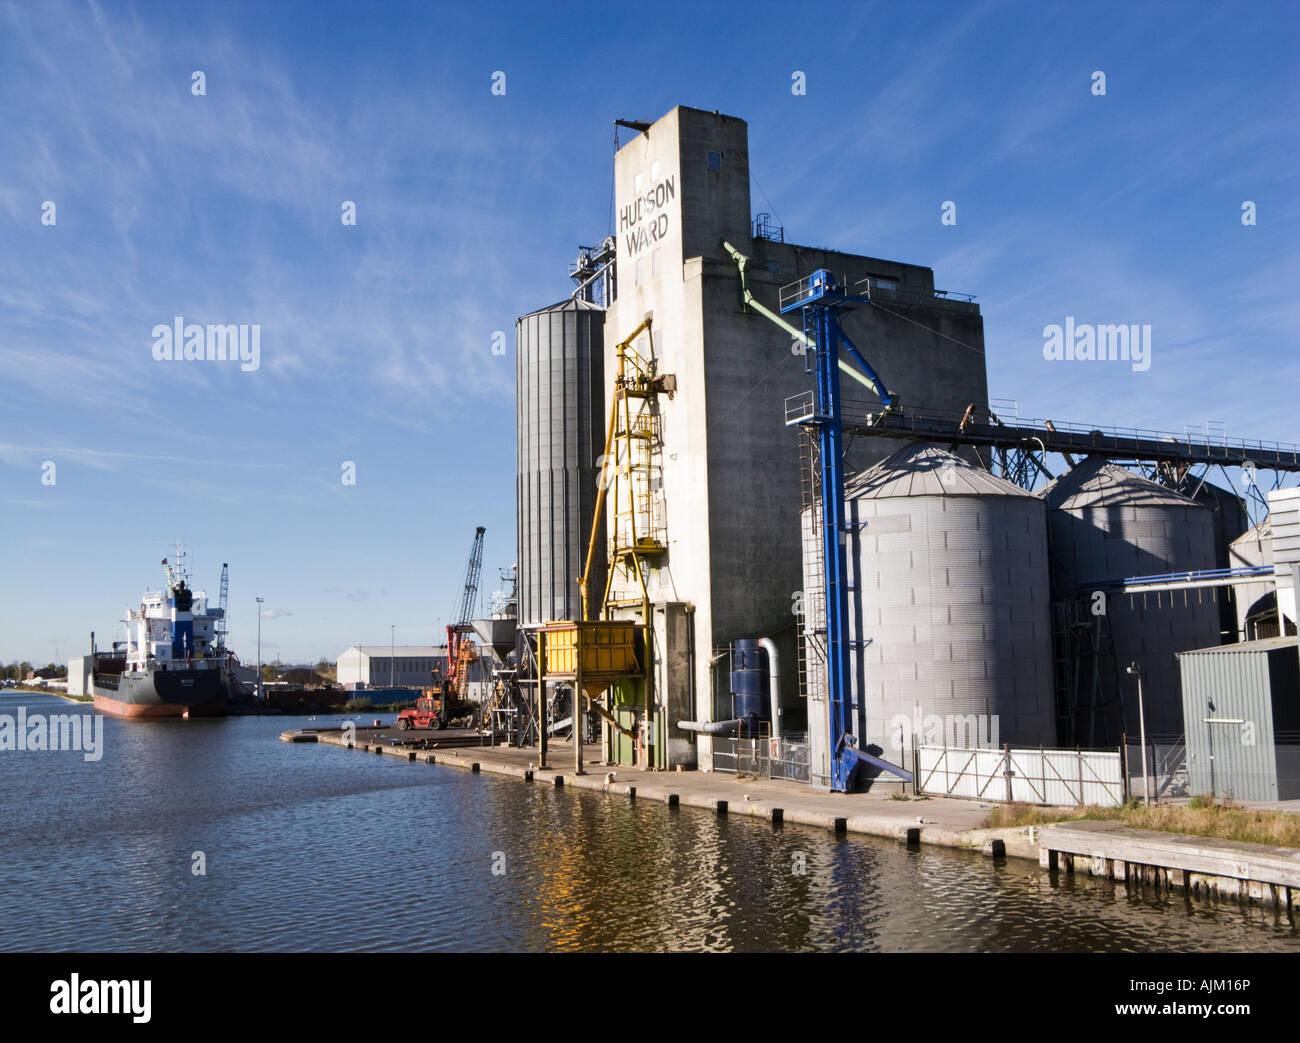 Port docks in Goole, East Yorkshire, UK - Stock Image